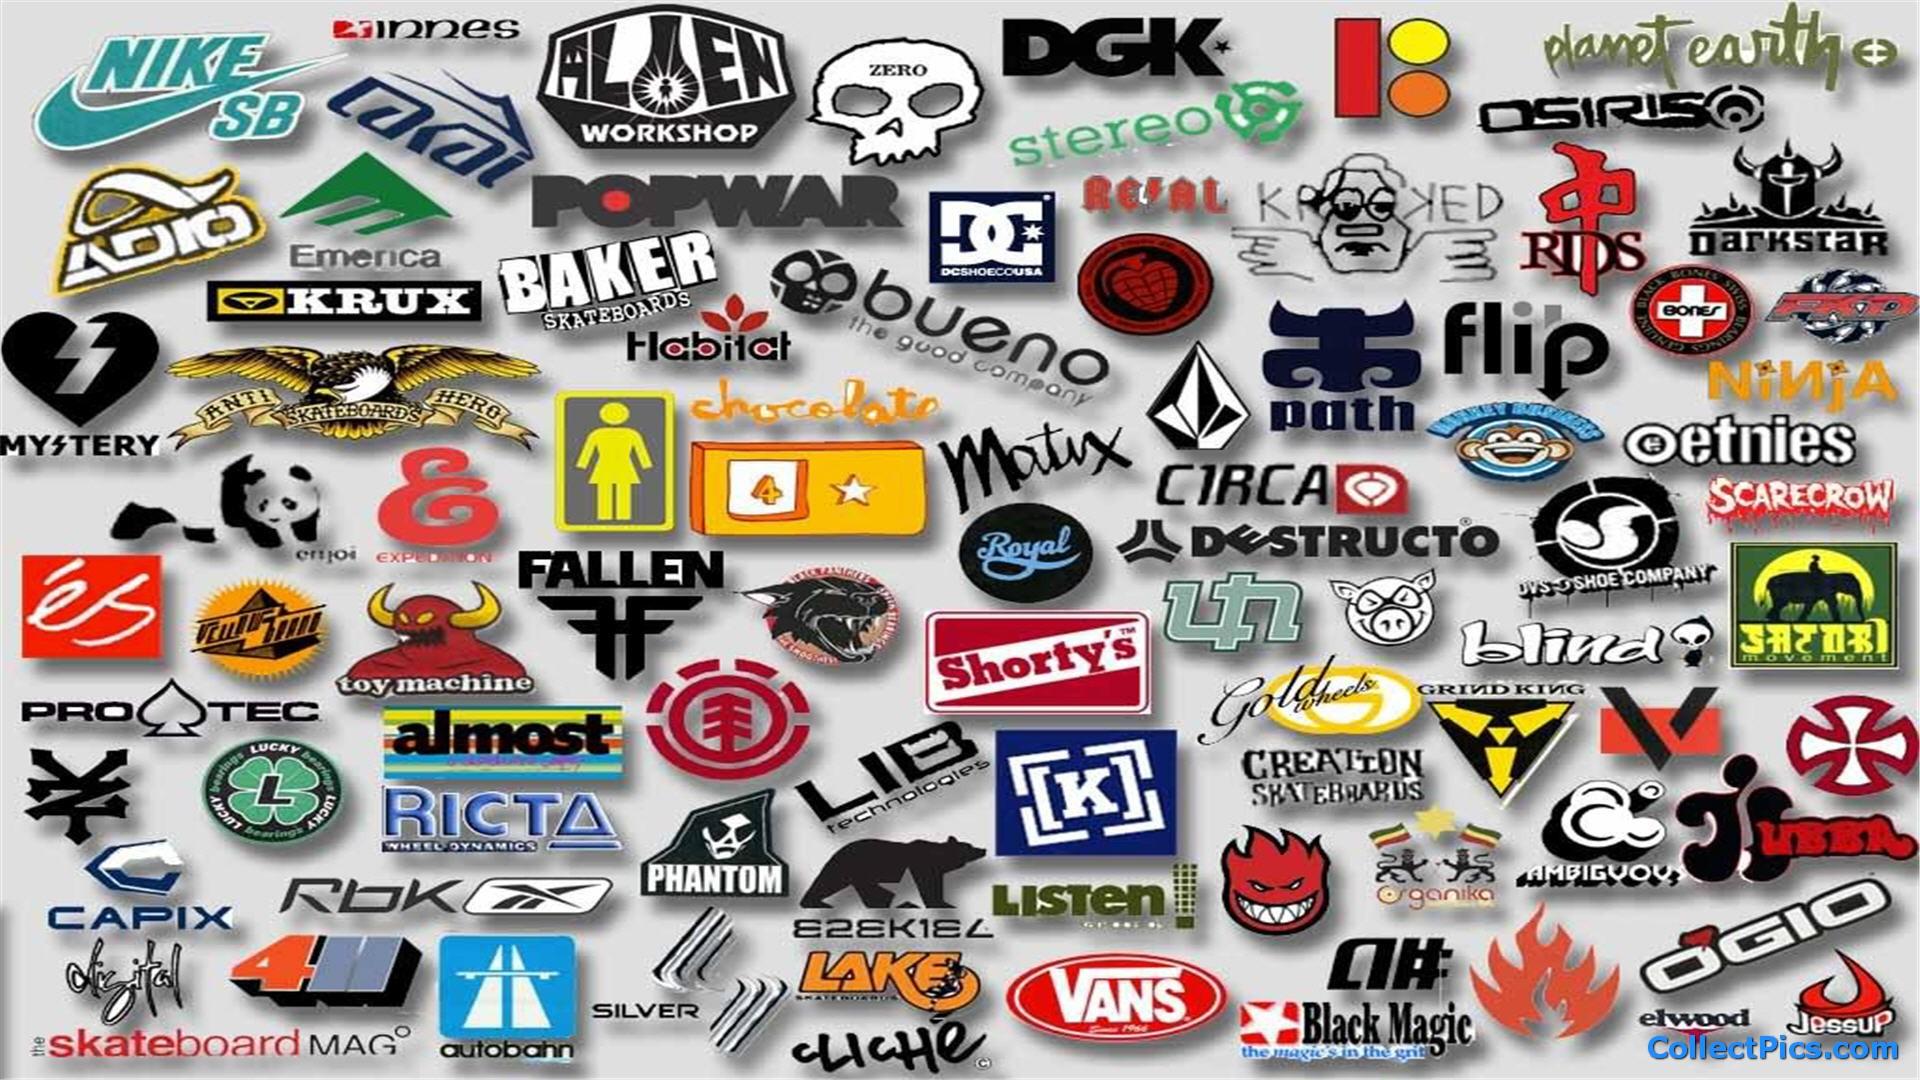 Skateboard Logos Wallpaper HD 1920x1080 4993 1920x1080